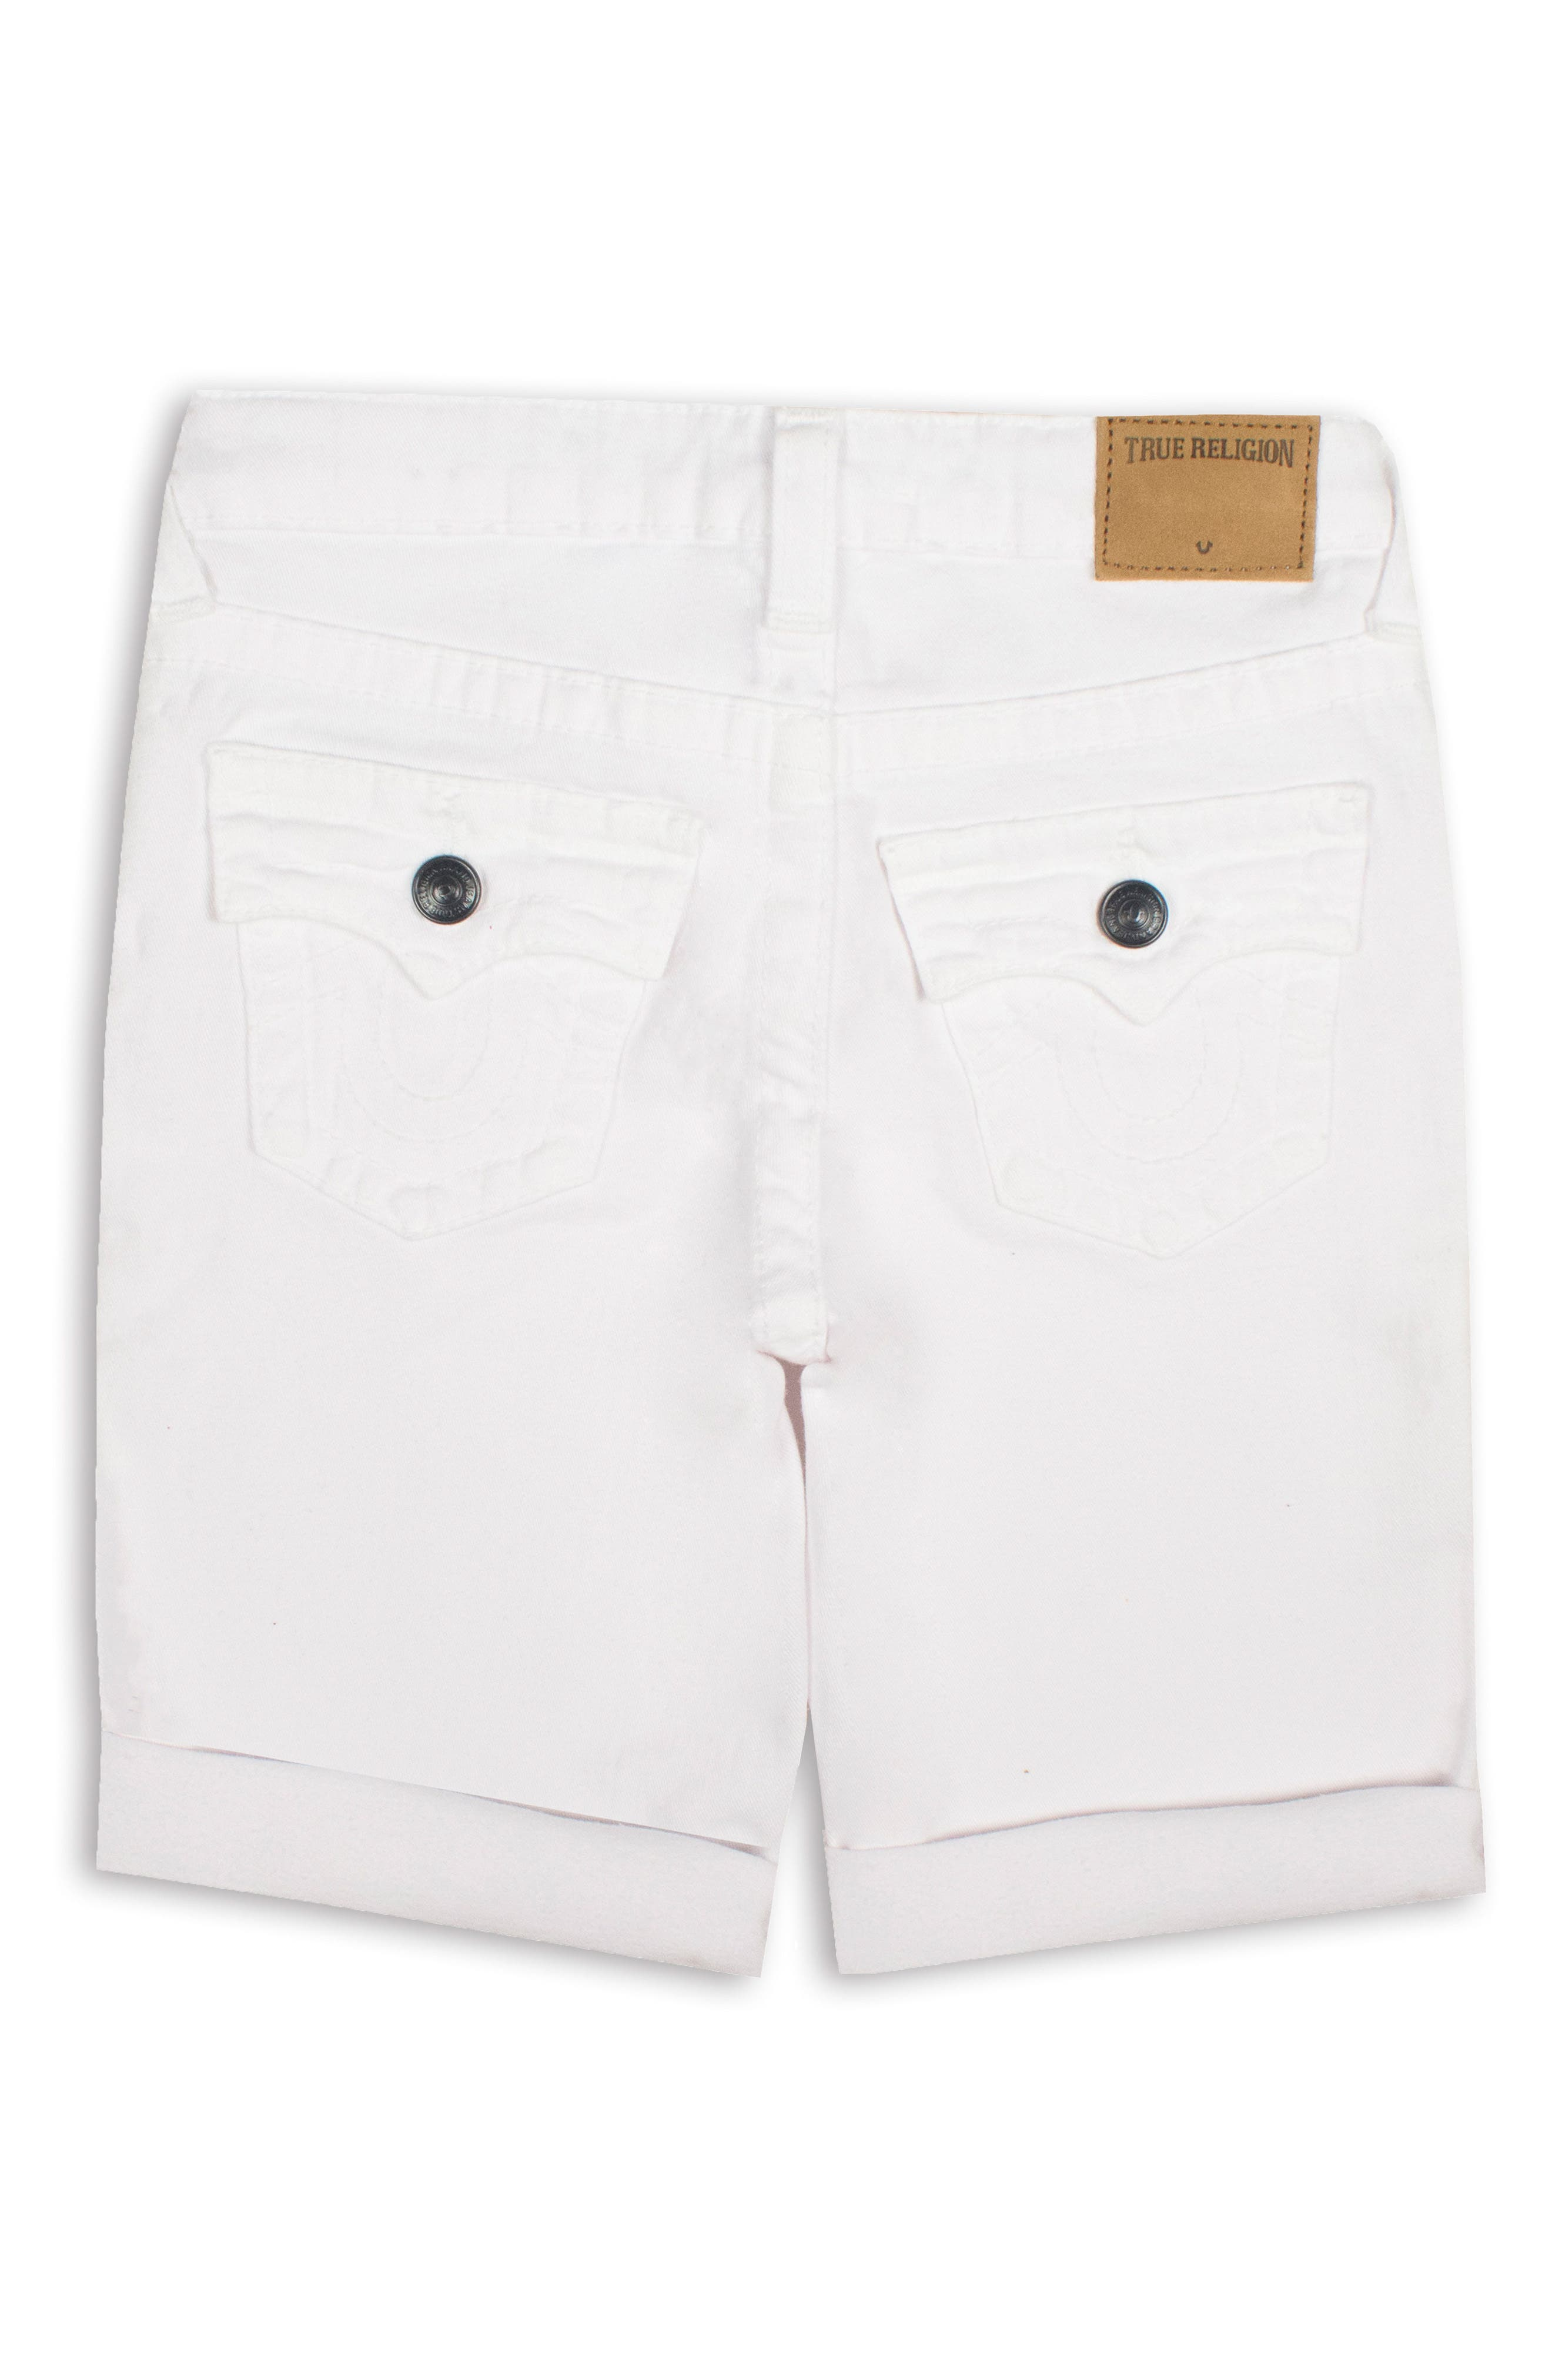 Geno Denim Shorts,                             Alternate thumbnail 2, color,                             White